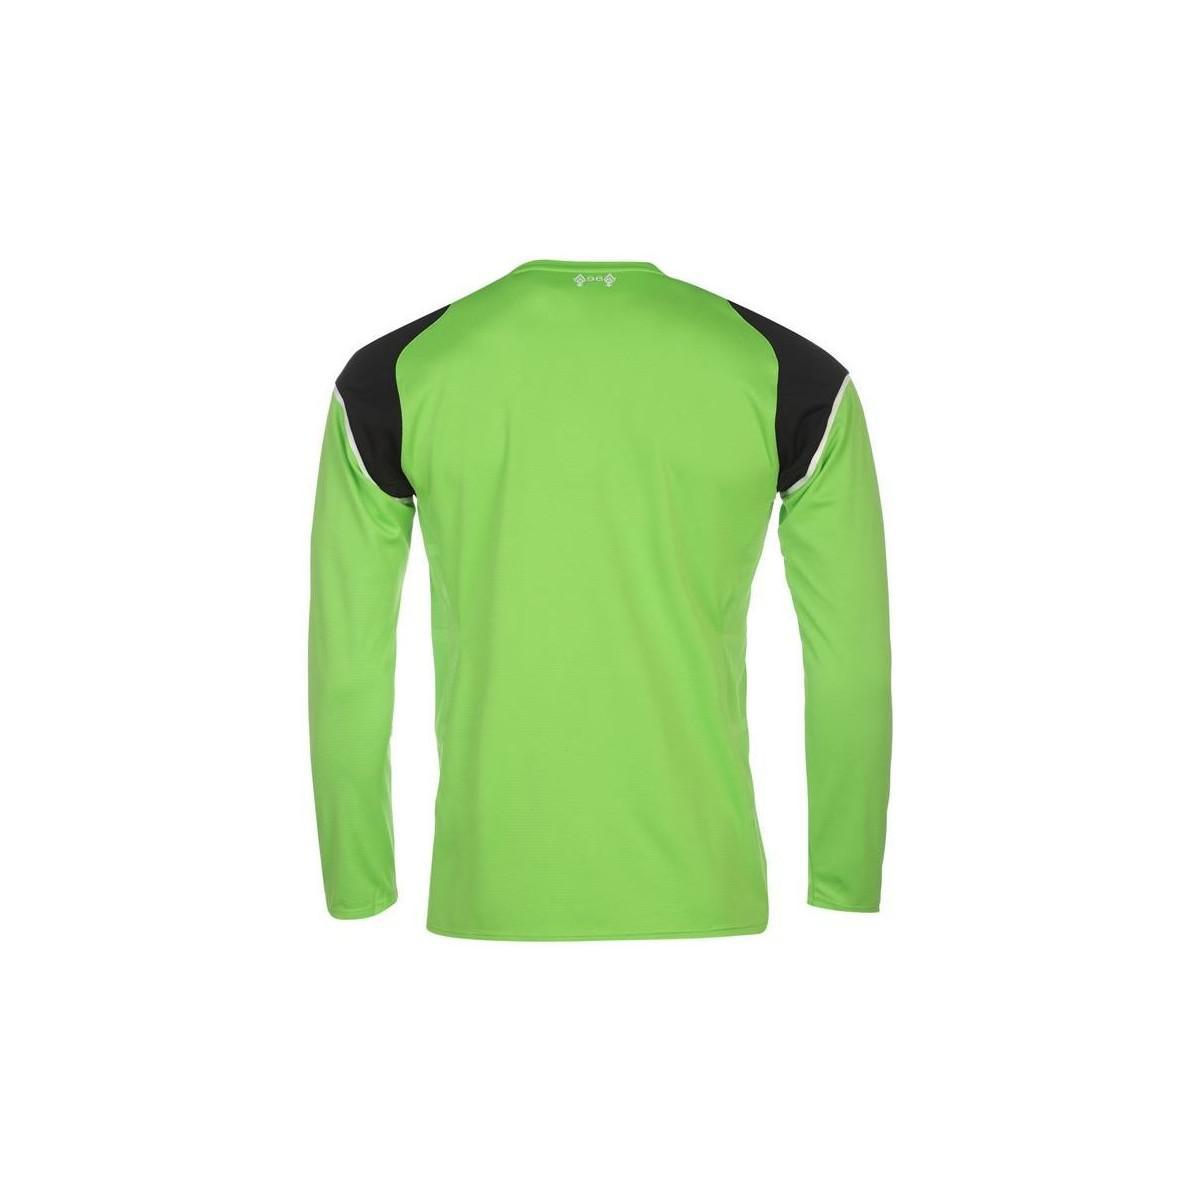 ba36fdb87 ... ireland liverpool home goalkeeper shirt mignolet 22 mens in. view  fullscreen 0cfd3 351b0